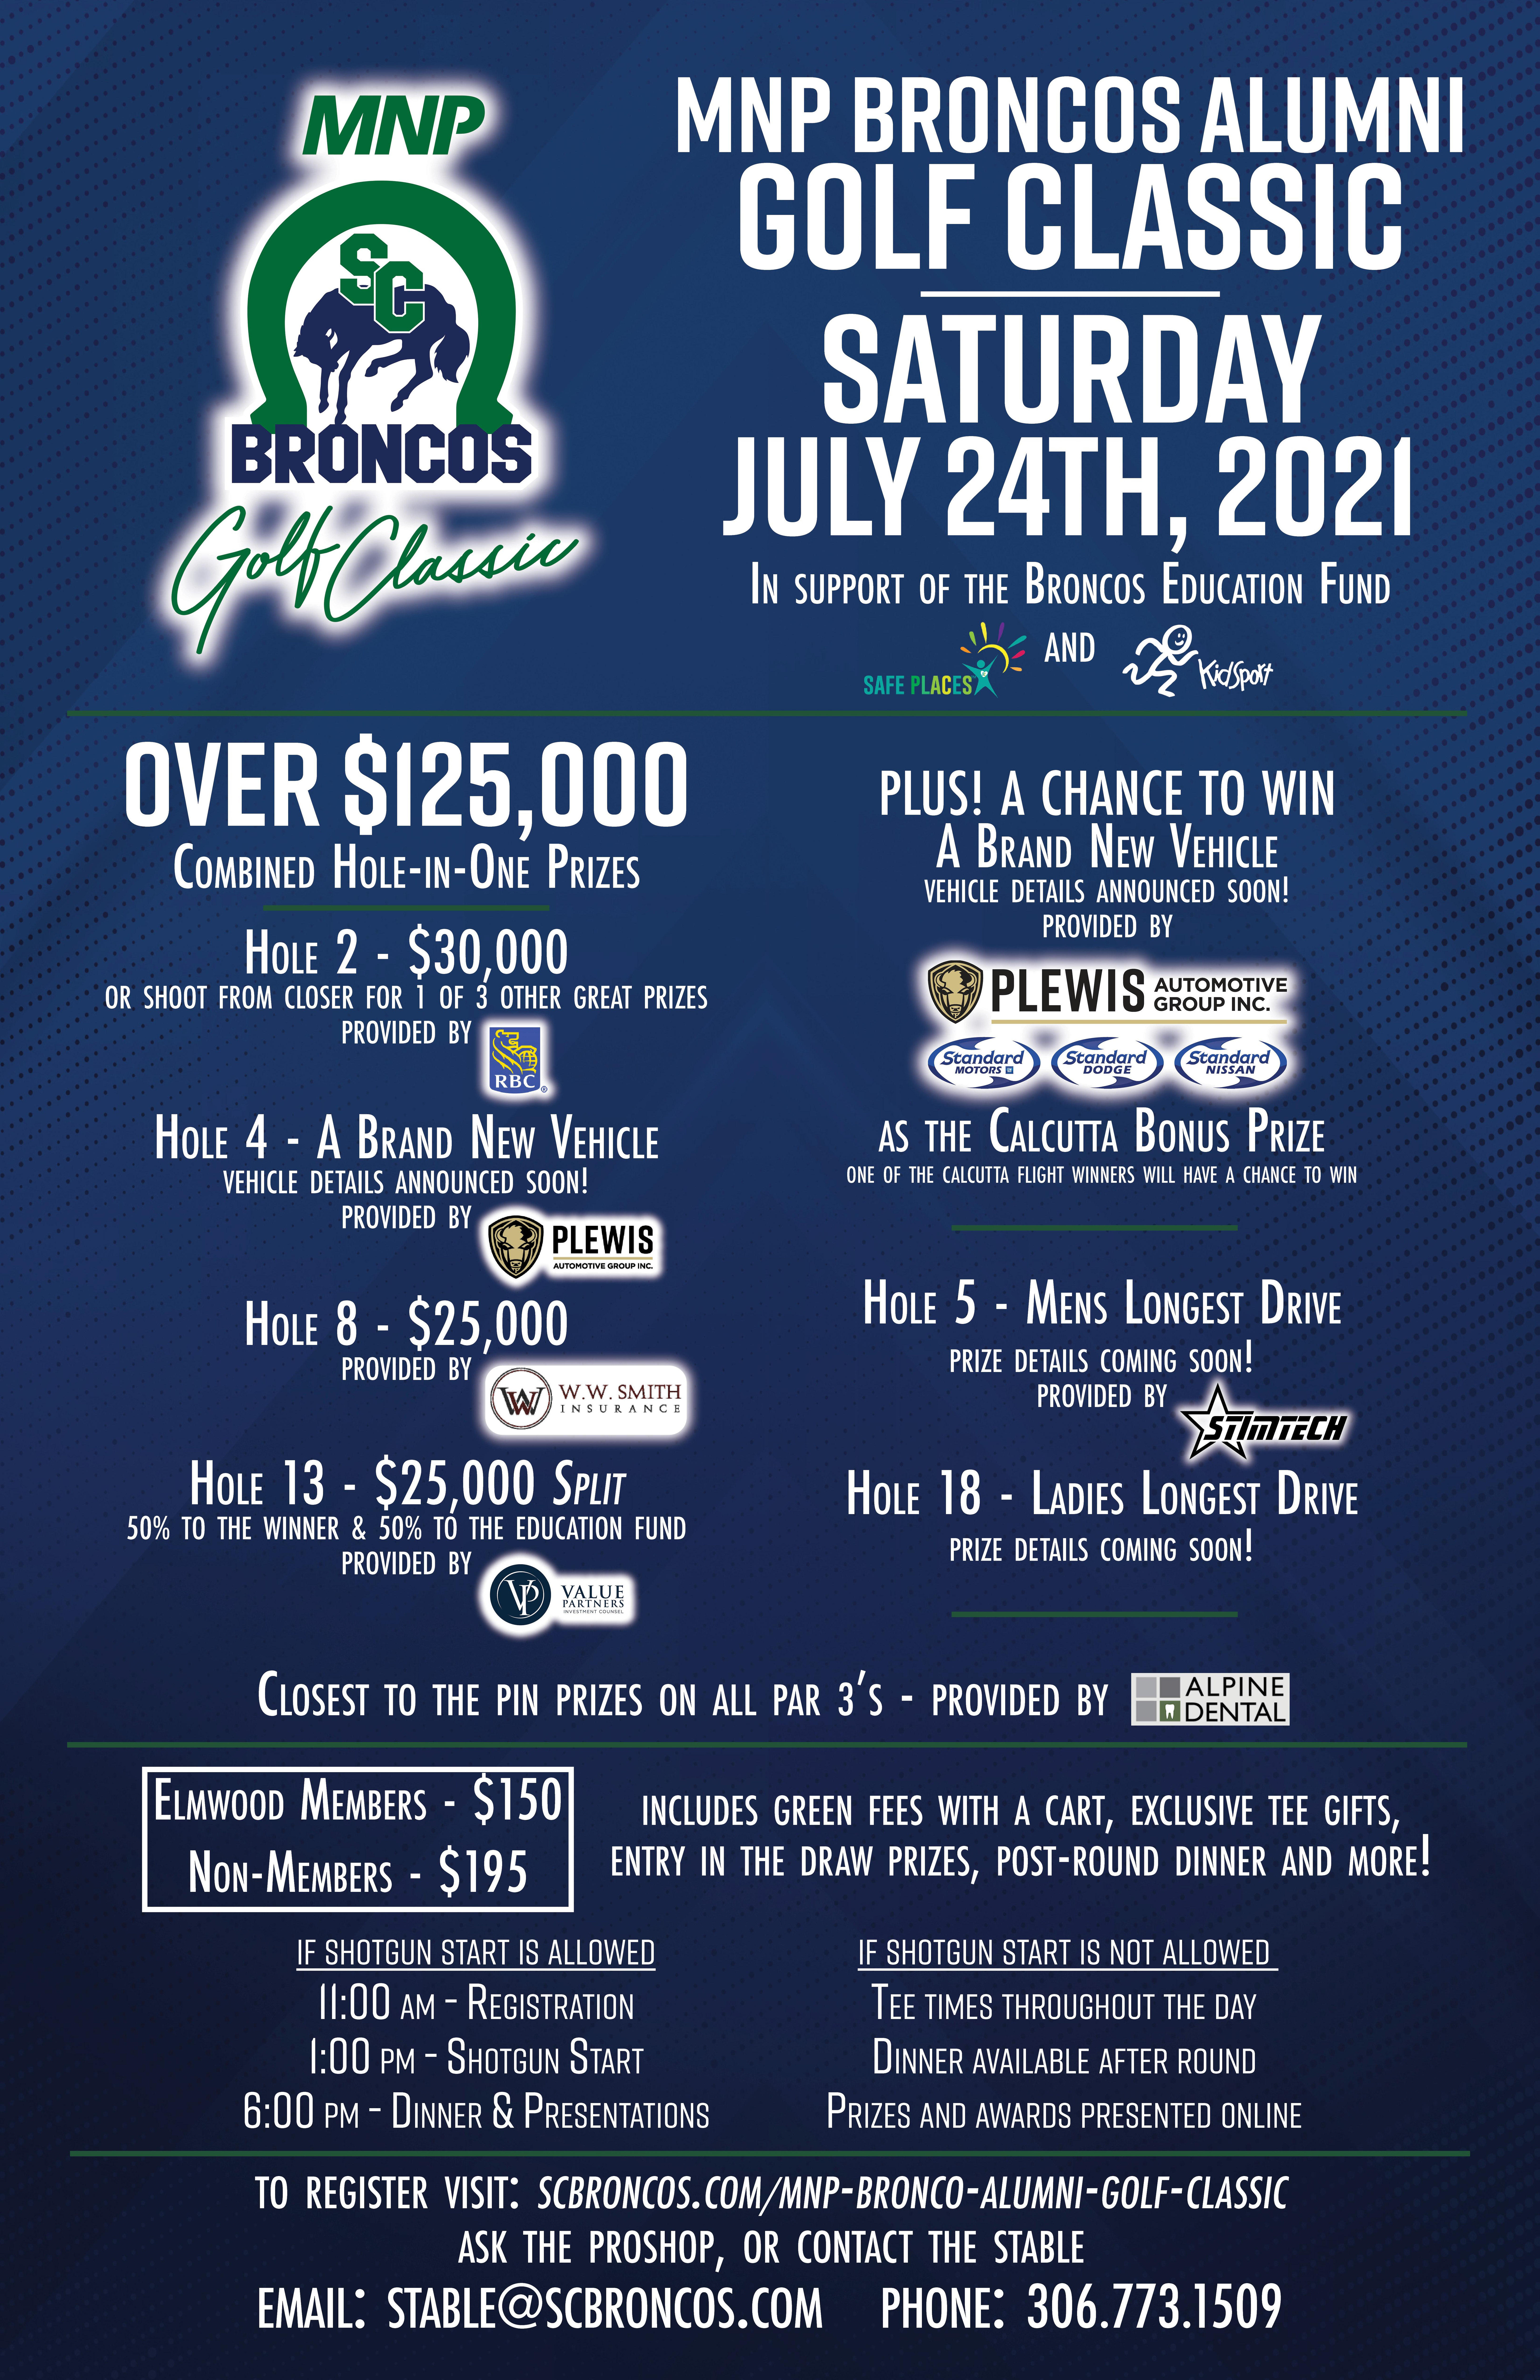 MNP Broncos Alumni Golf Classic - Promotional Poster - JPG